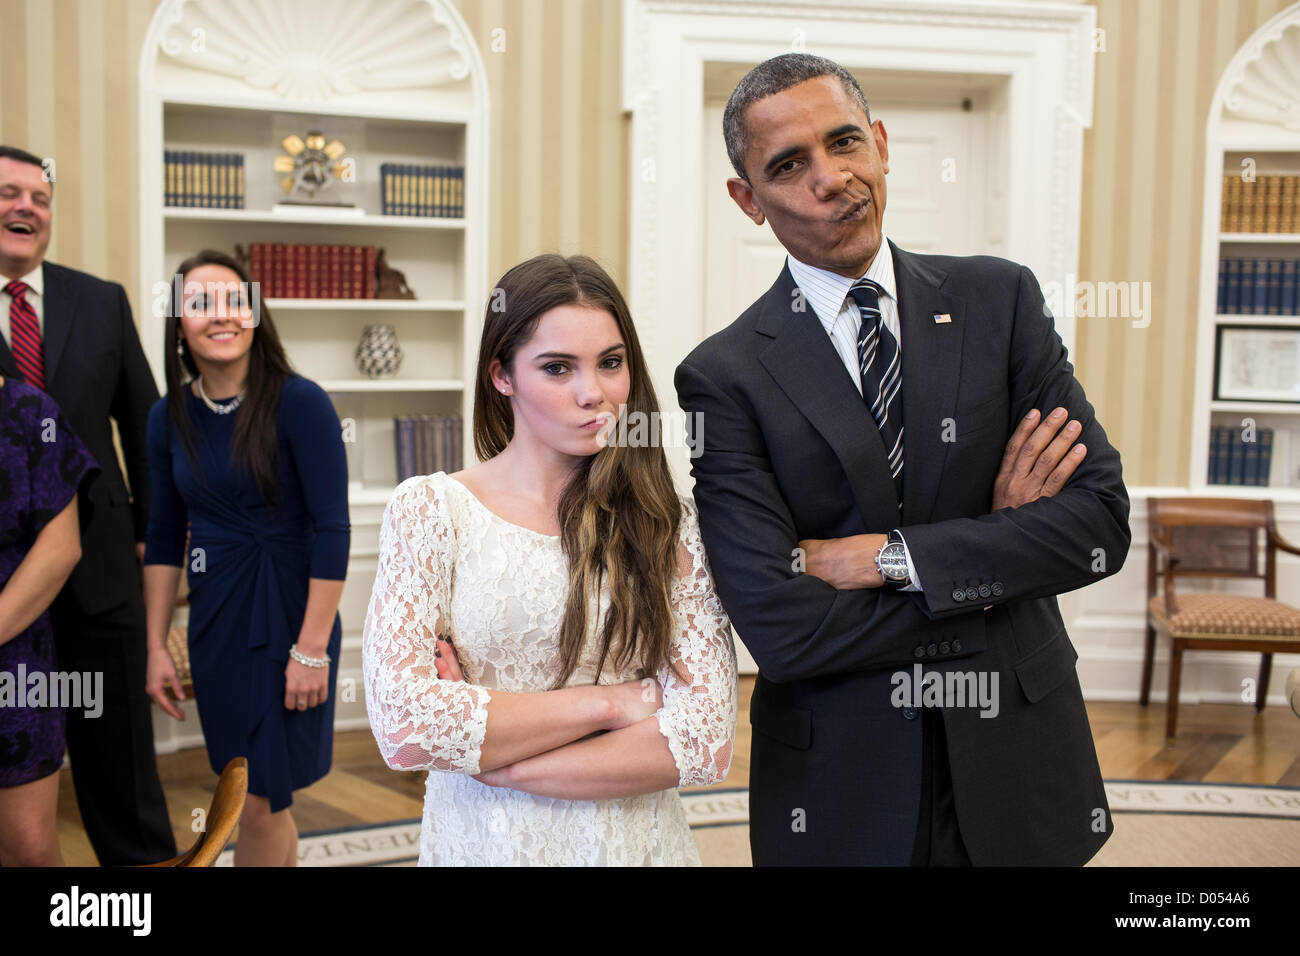 Us President Barack Obama Jokingly Mimics Us Olympic Gymnast Mckayla